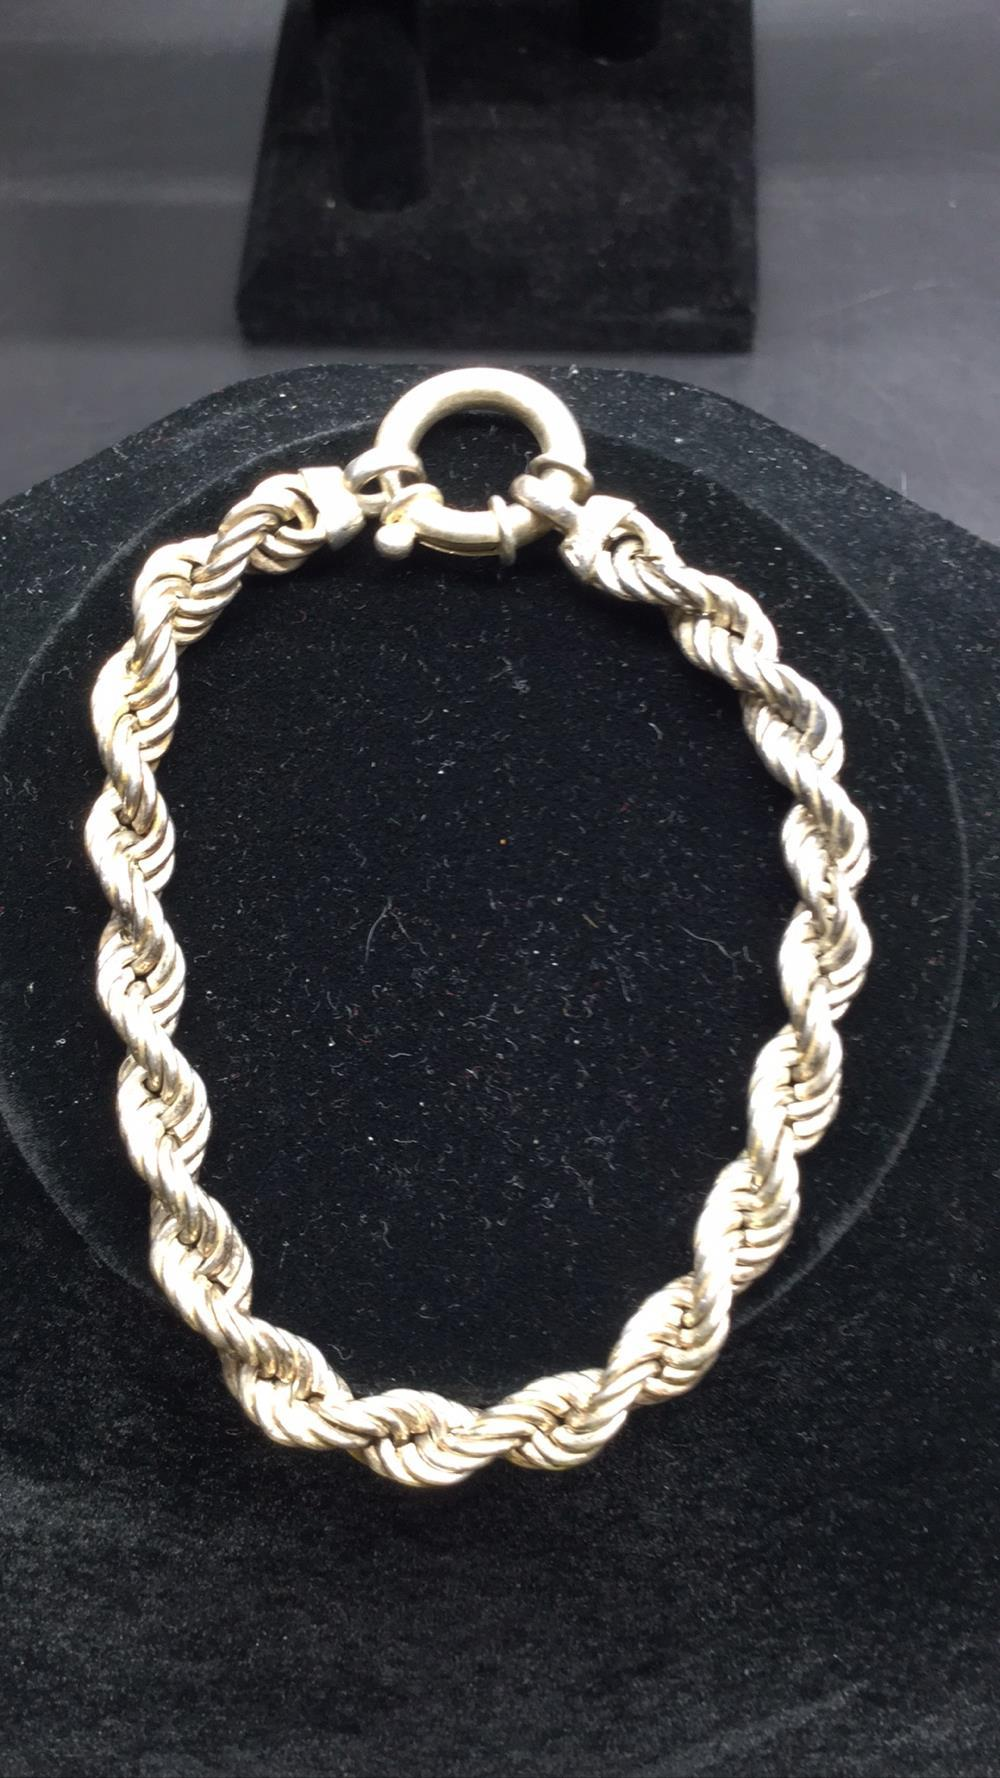 .925 thick rope bracelet